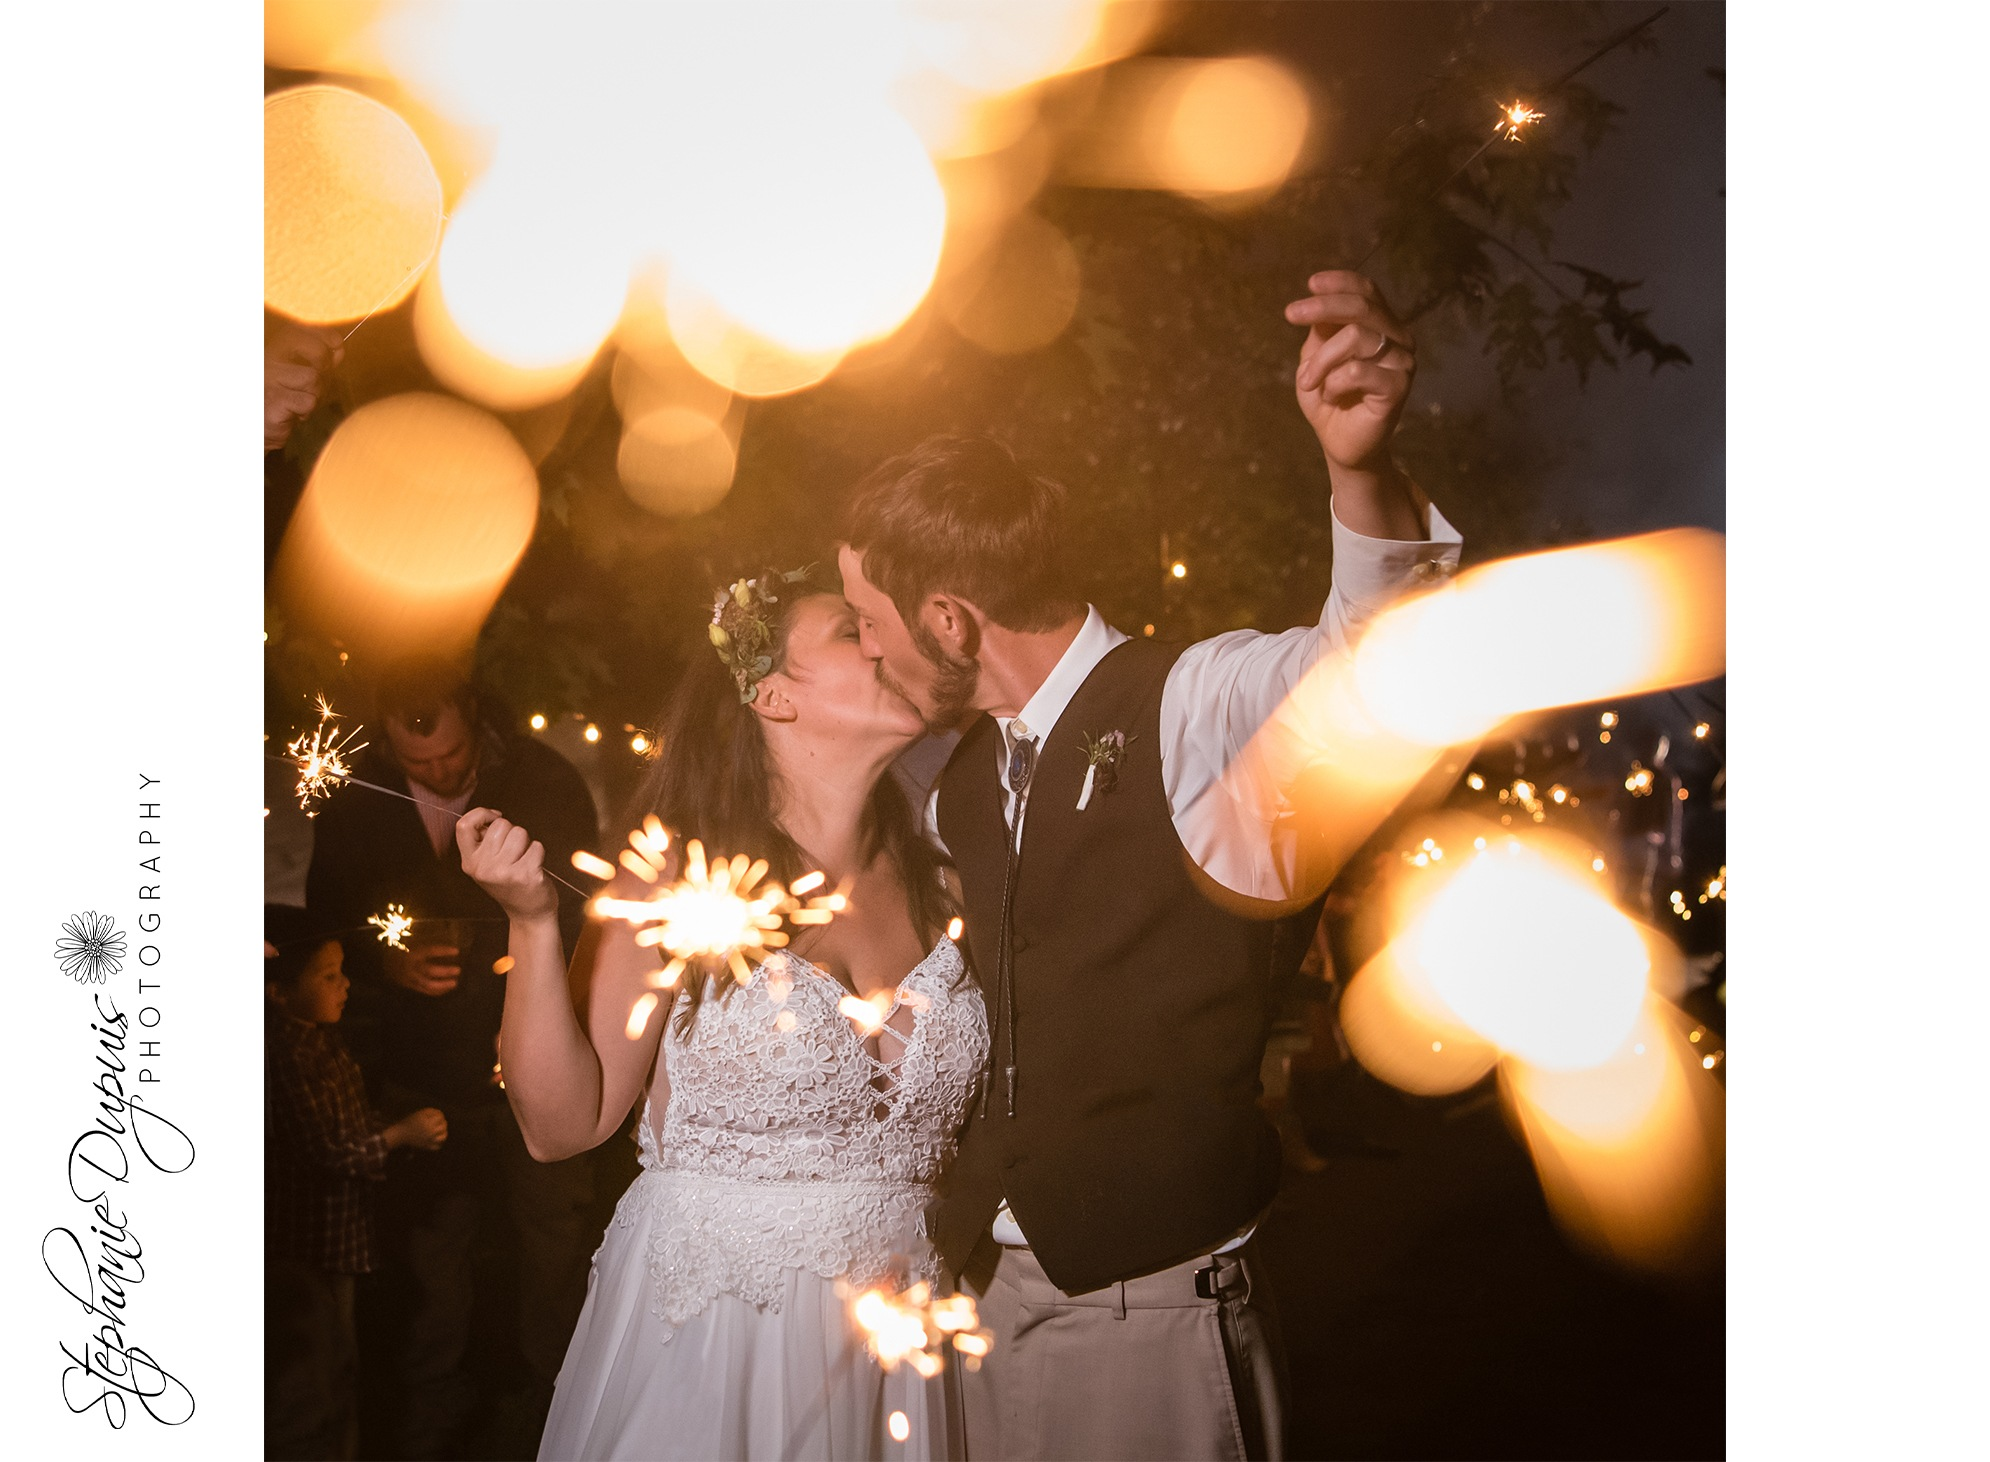 Hicks Wedding 22 - Portfolio: Hick's Wedding